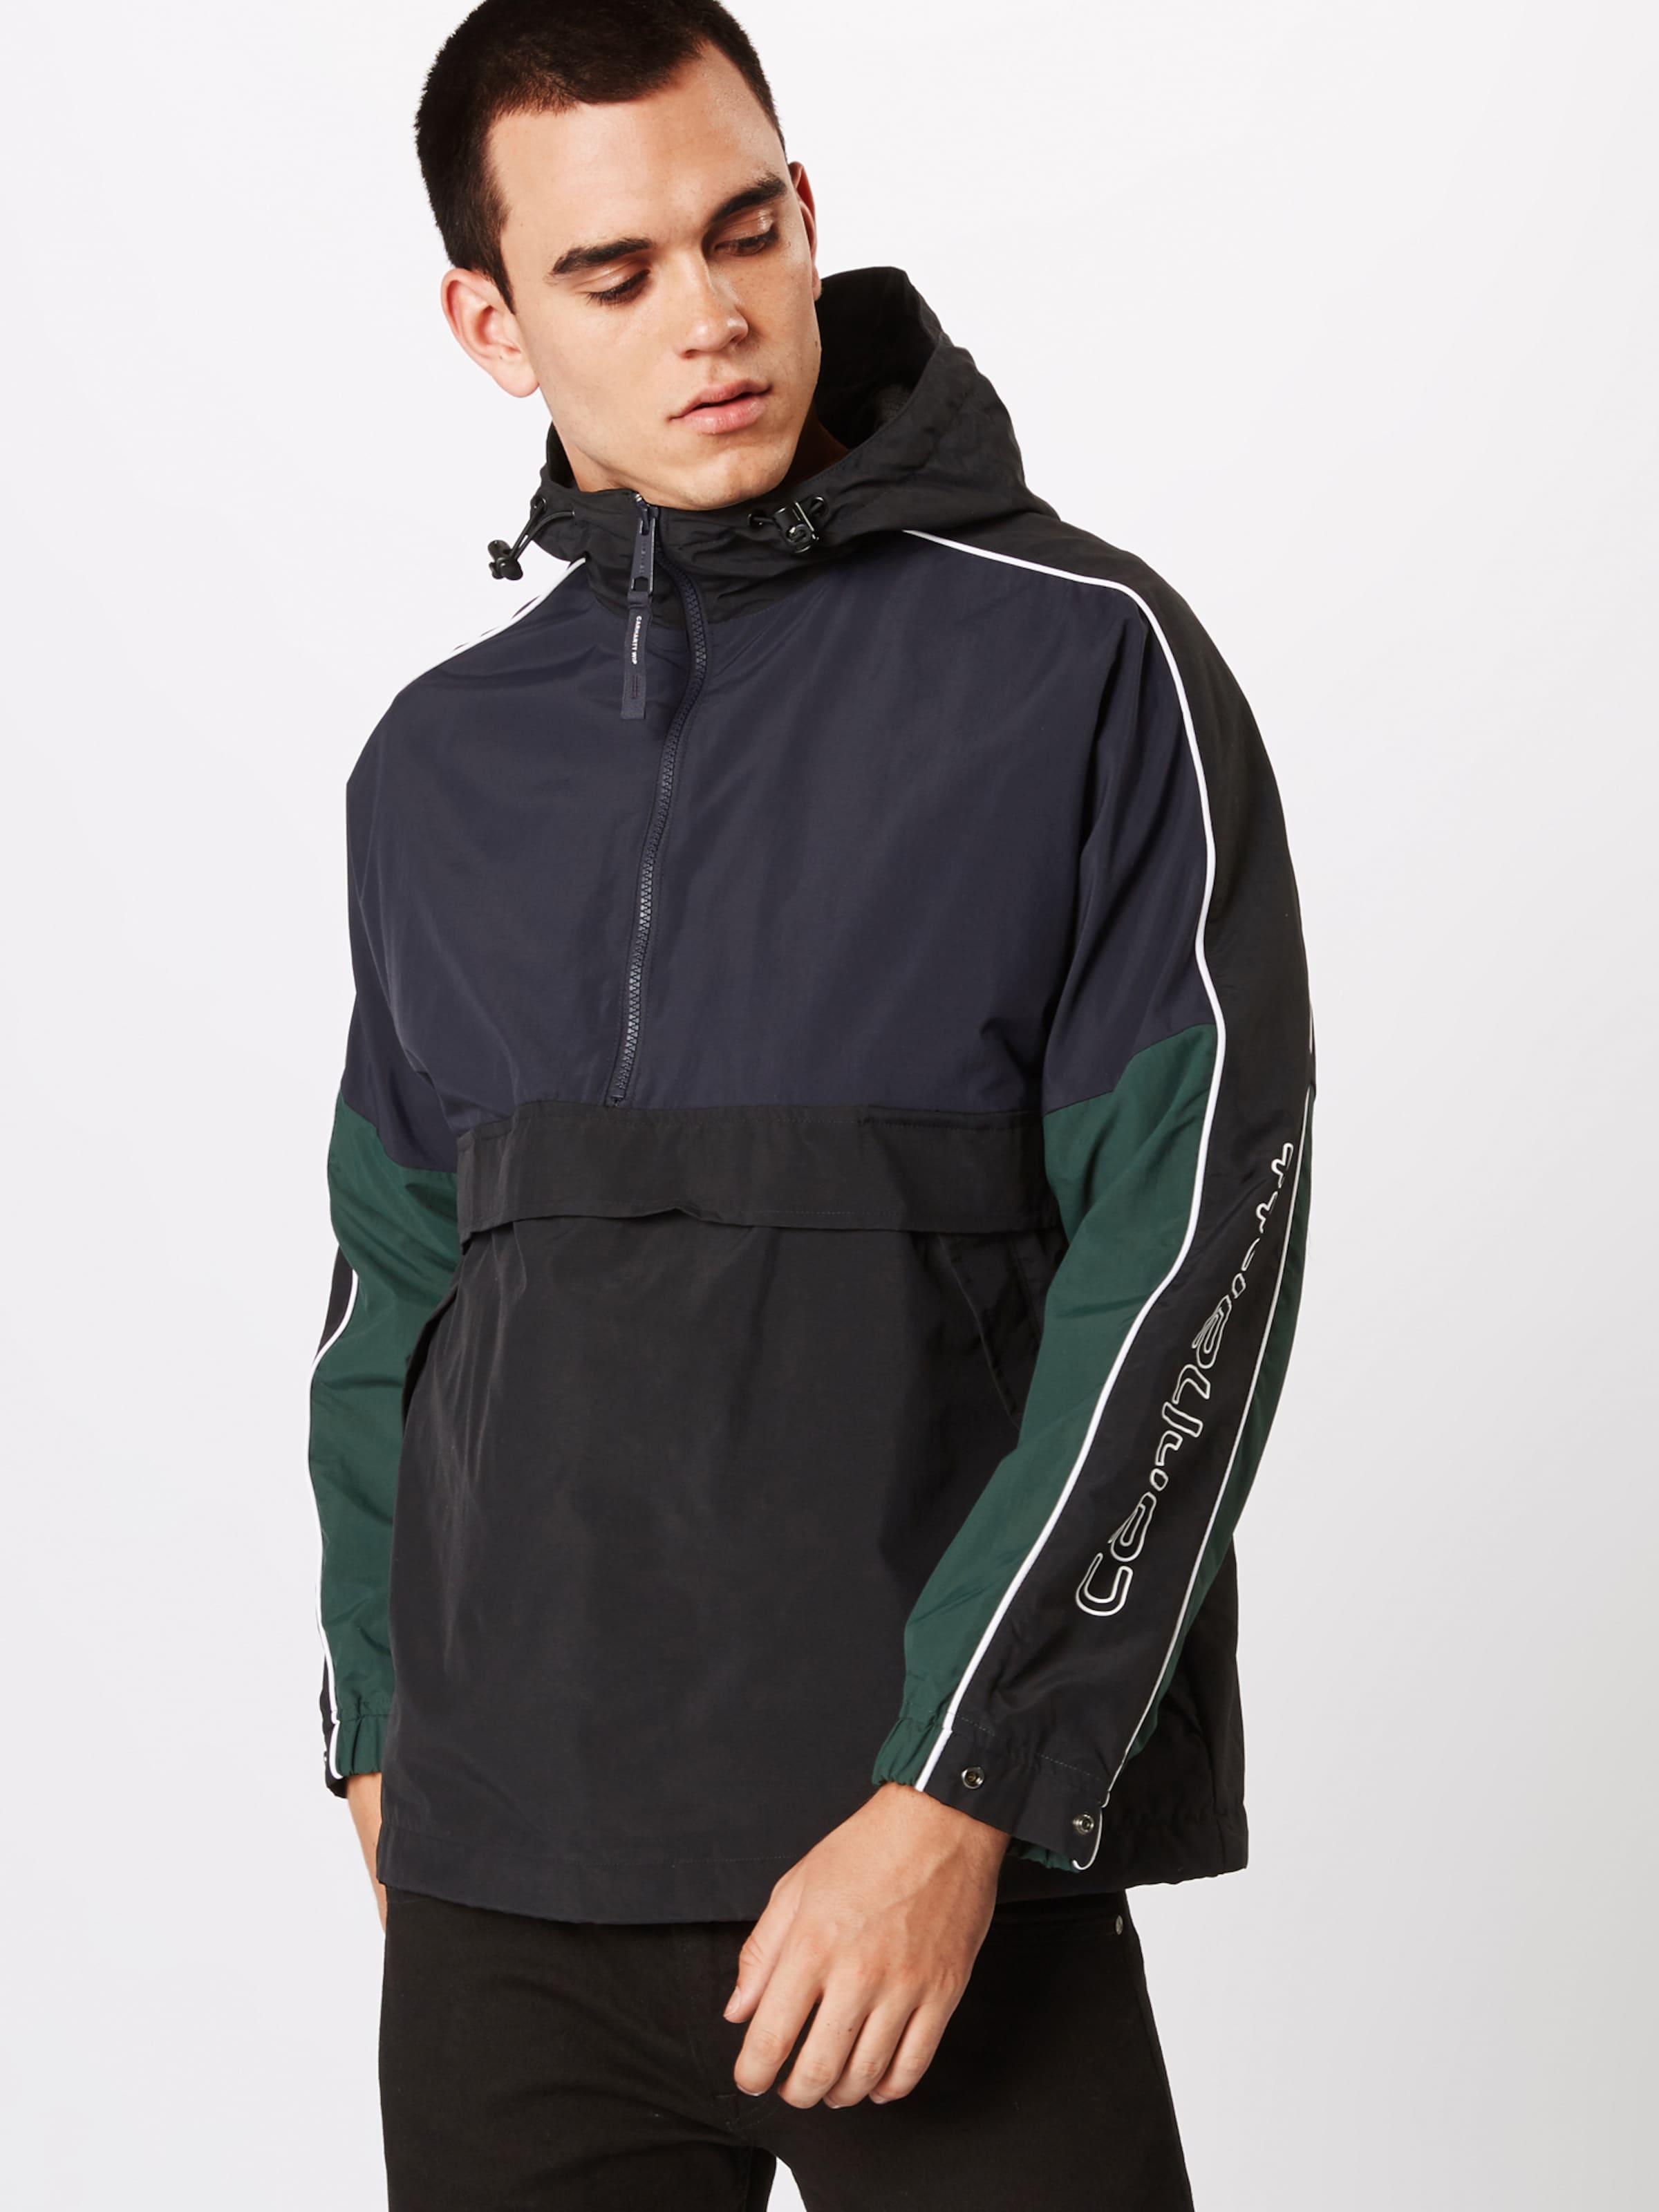 Pullover' Carhartt Jacke In Wip NavyDunkelgrün Schwarz 'terrace 3qARj5Lc4